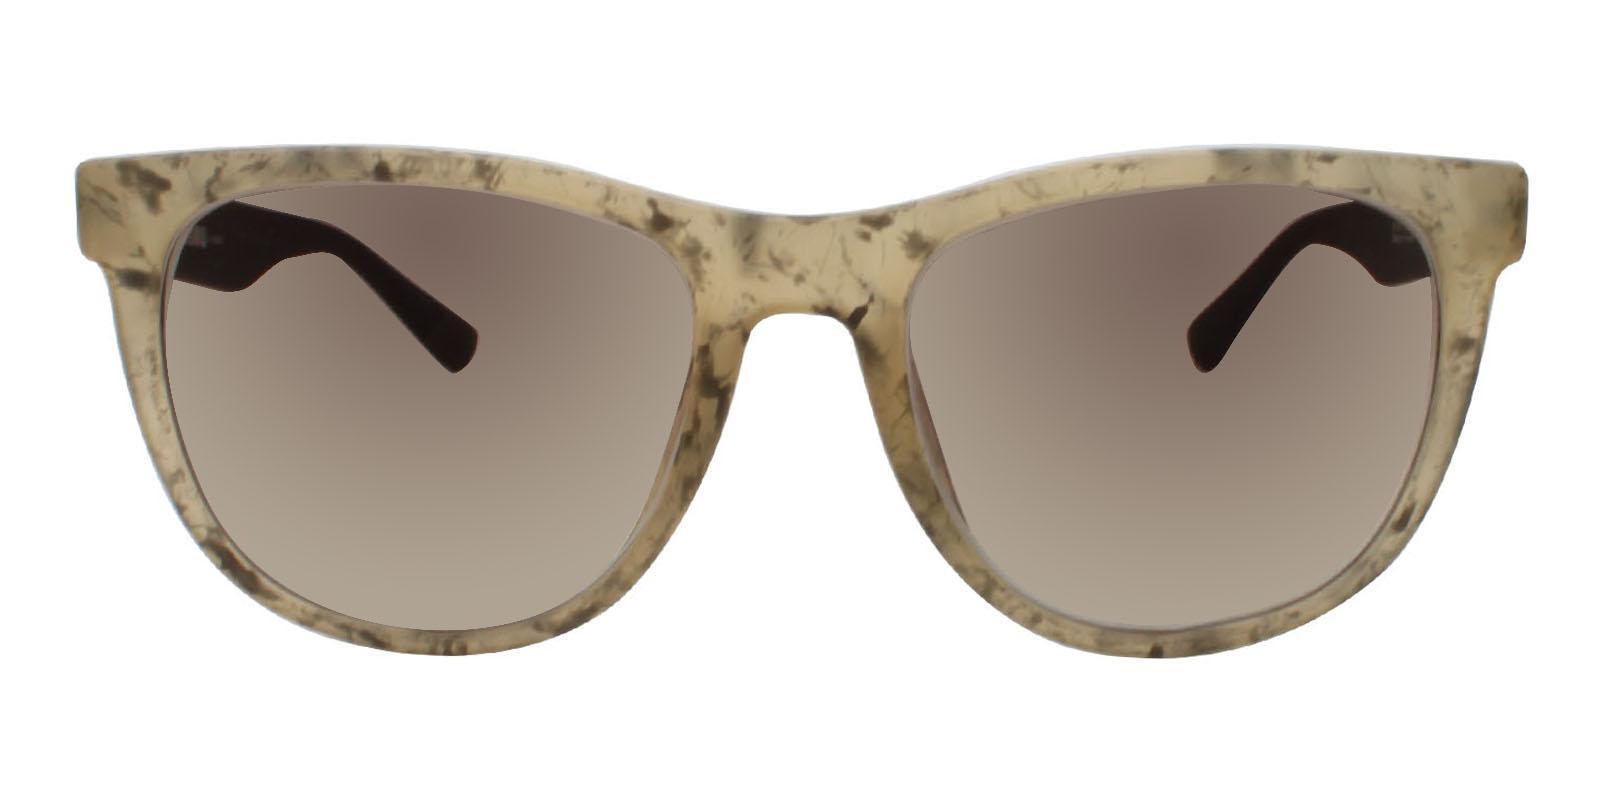 Hallstead Pattern TR Sunglasses , UniversalBridgeFit Frames from ABBE Glasses